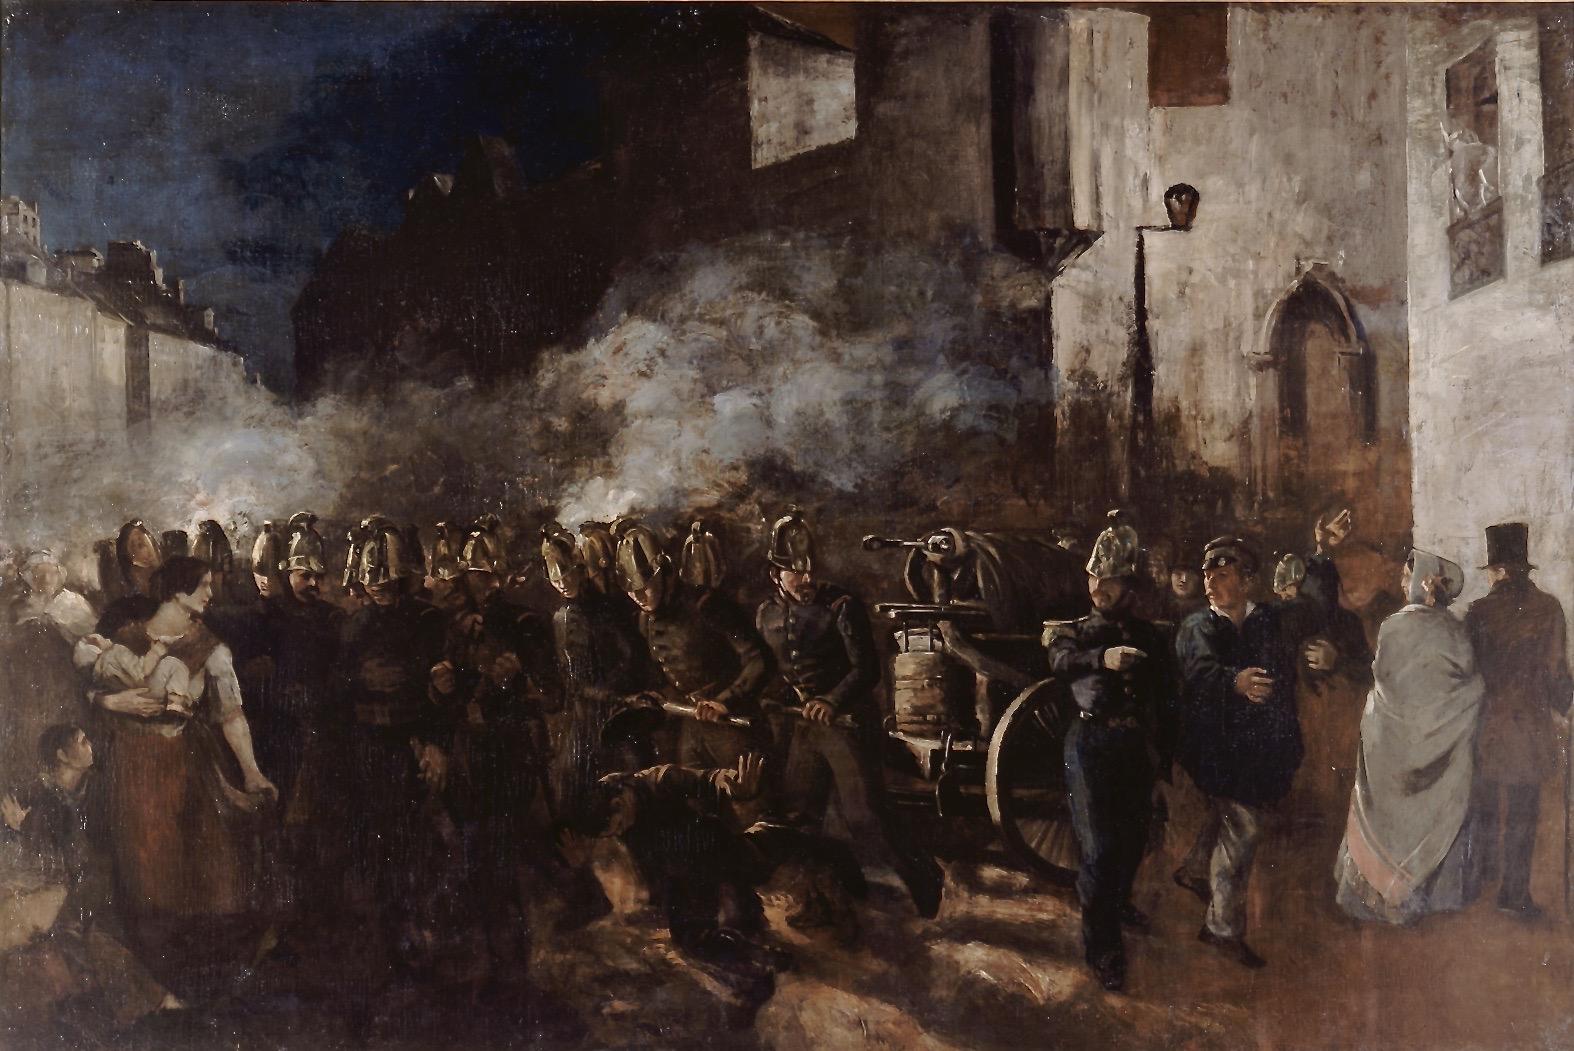 Pompiers_courant_au_feu_by_Gustave_Courbet_1851